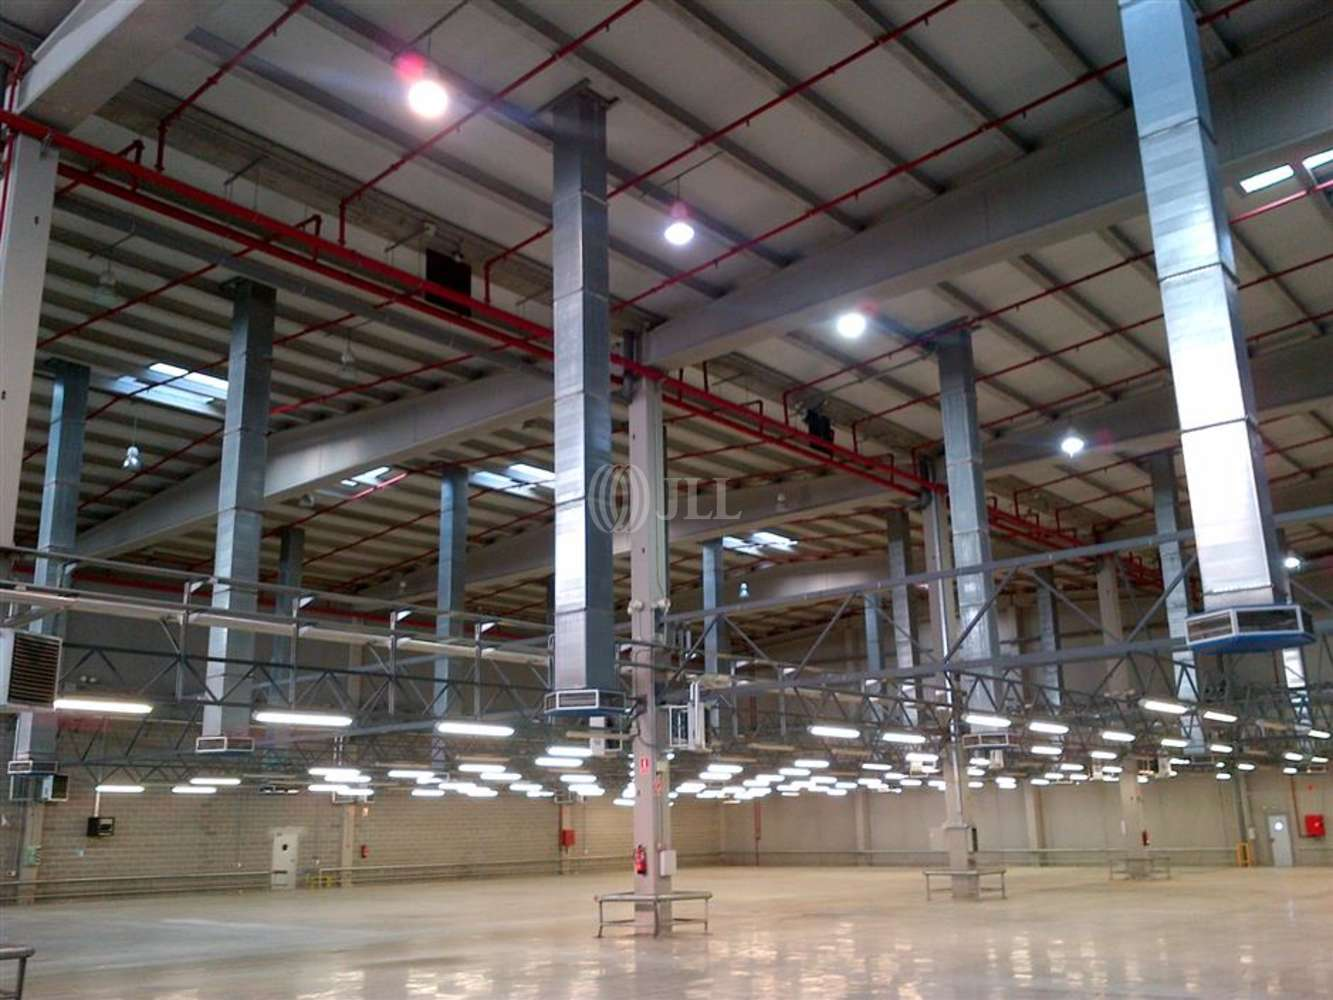 Naves industriales y logísticas Barcelona, 08040 - Nave Logistica - B0059 - PI PARC LOGISTIC ZONA FRANCA - 11507